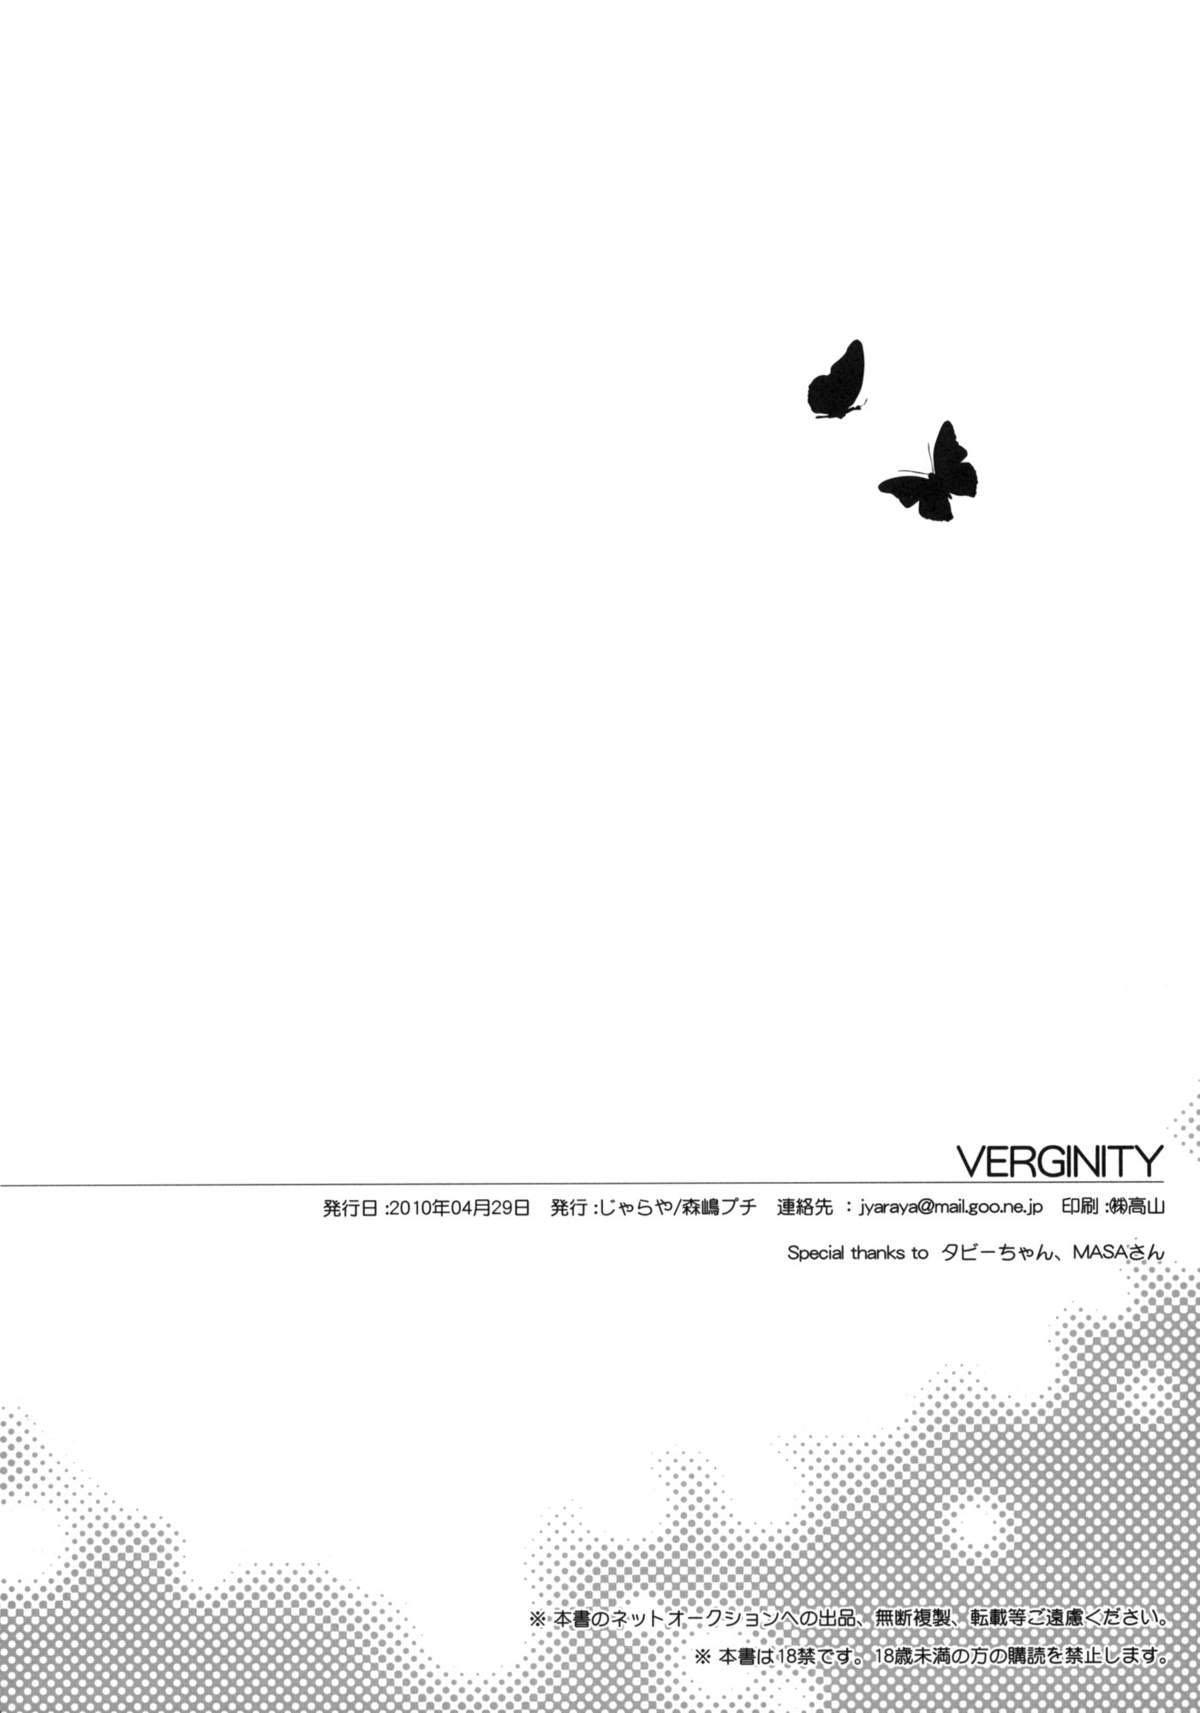 Virginity 19